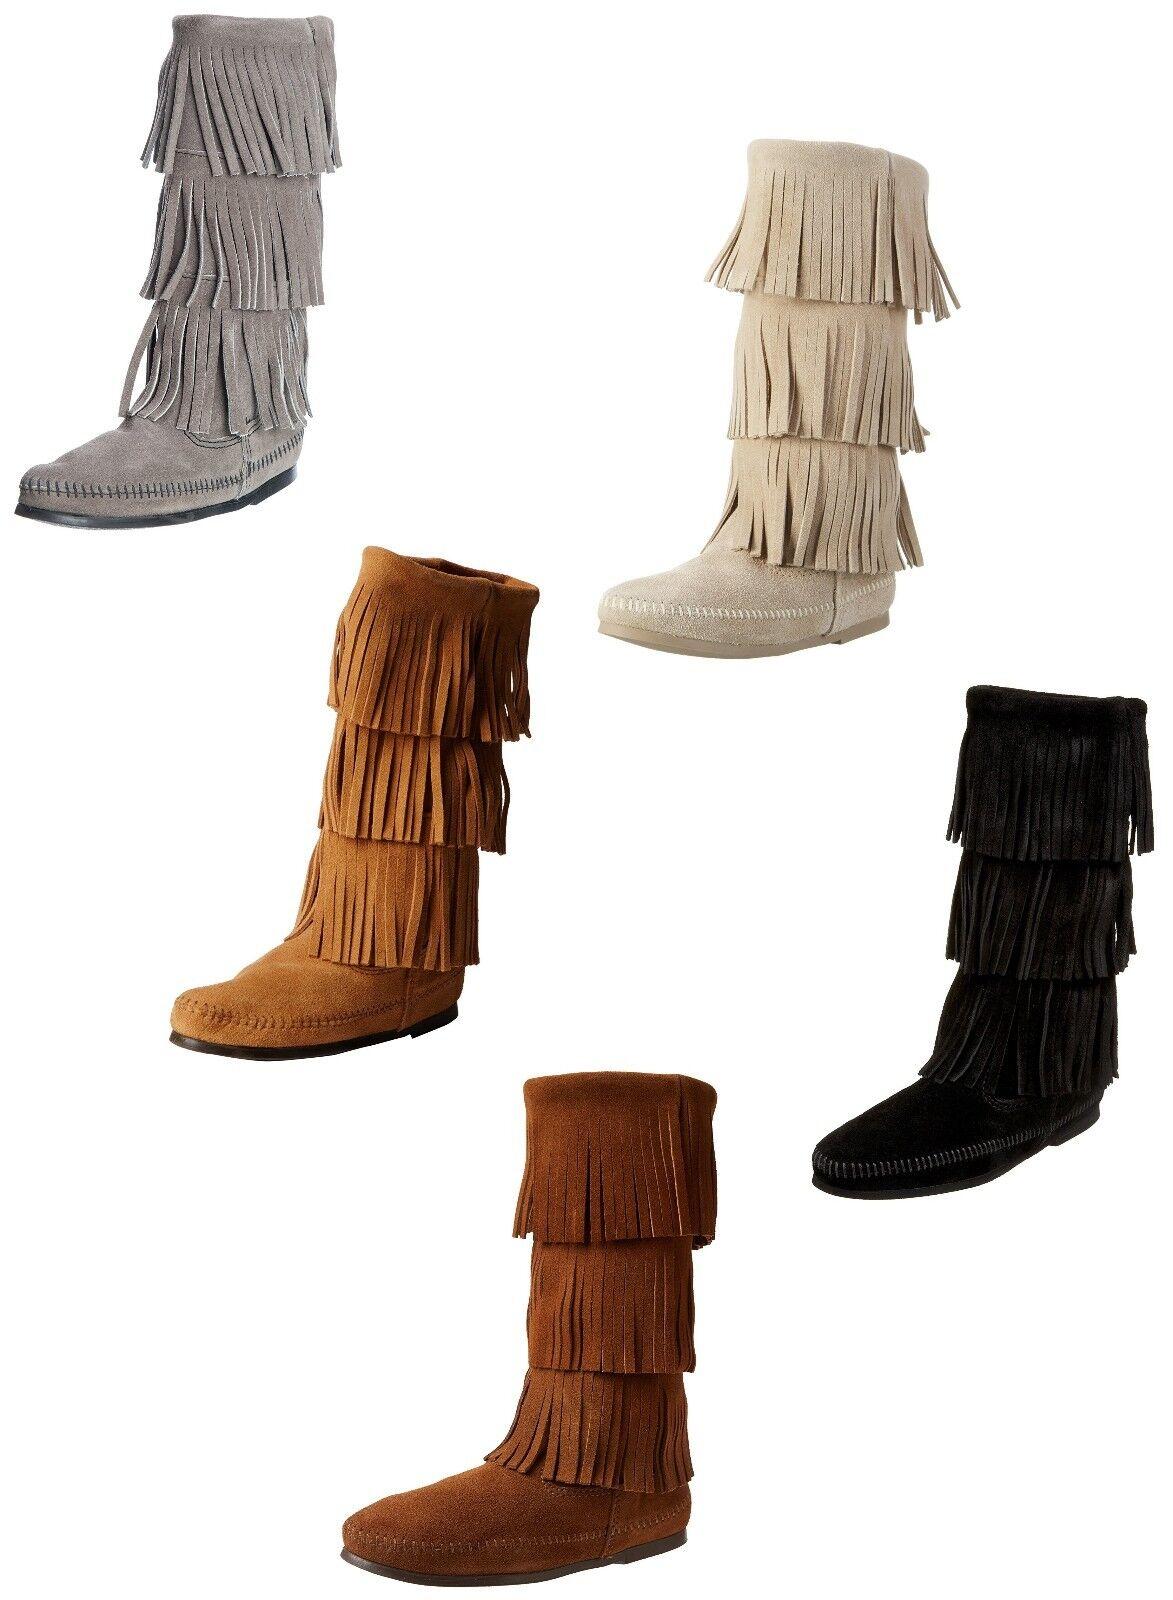 Men's/Women's Minnetonka Women's 3-Layer Fringe Boot economic New in stock Personalization trend